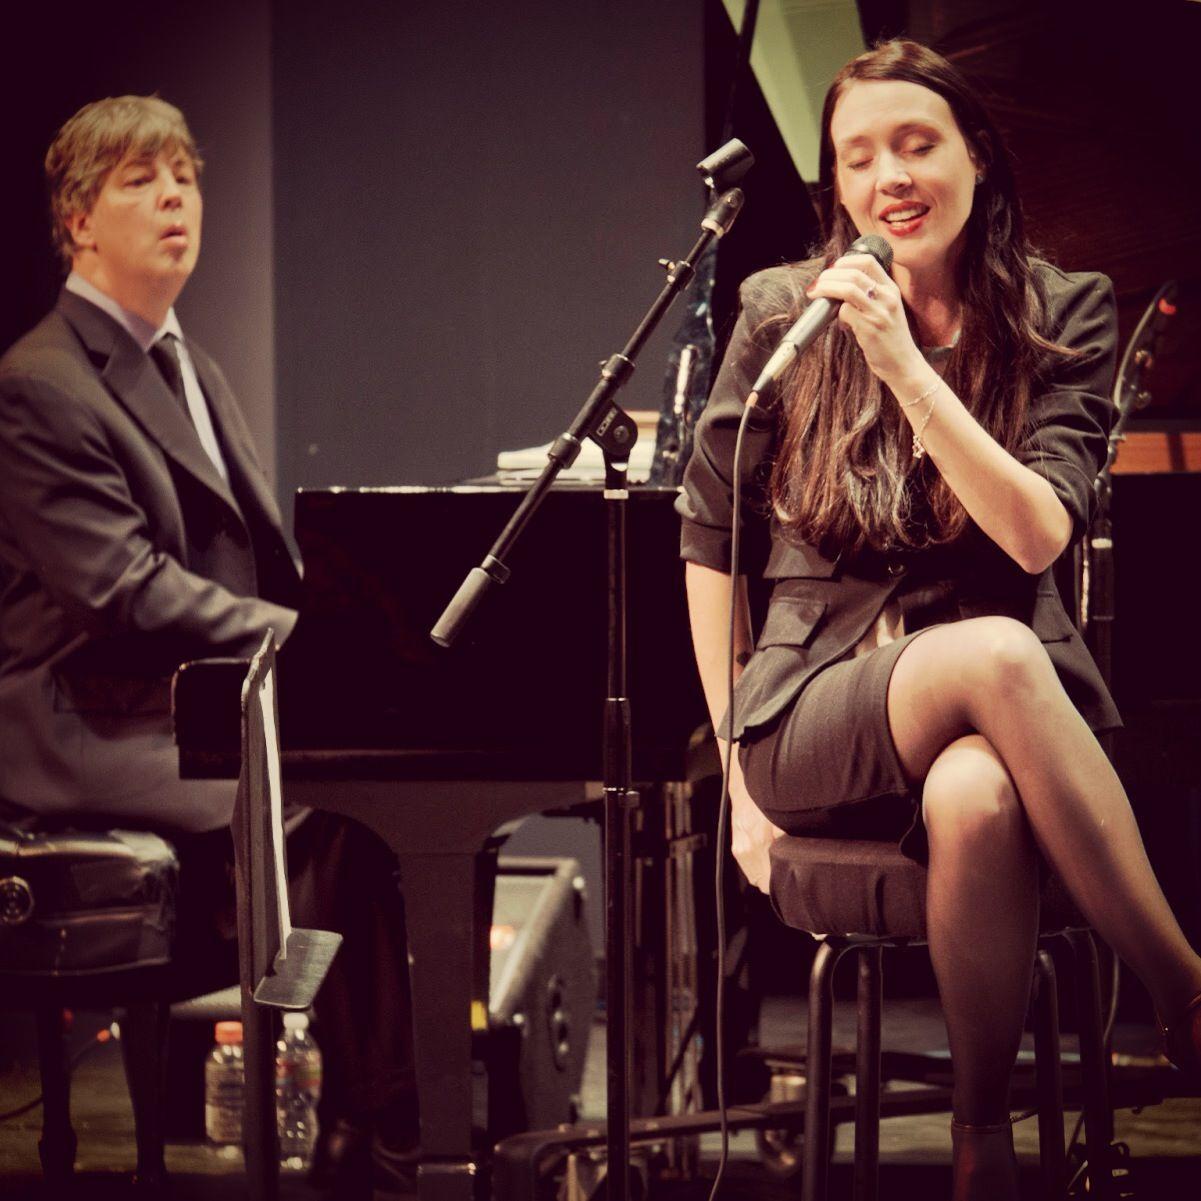 Winterlude jazz festival Megan Birdsall vocals with Wayne Hawkins piano : so good!